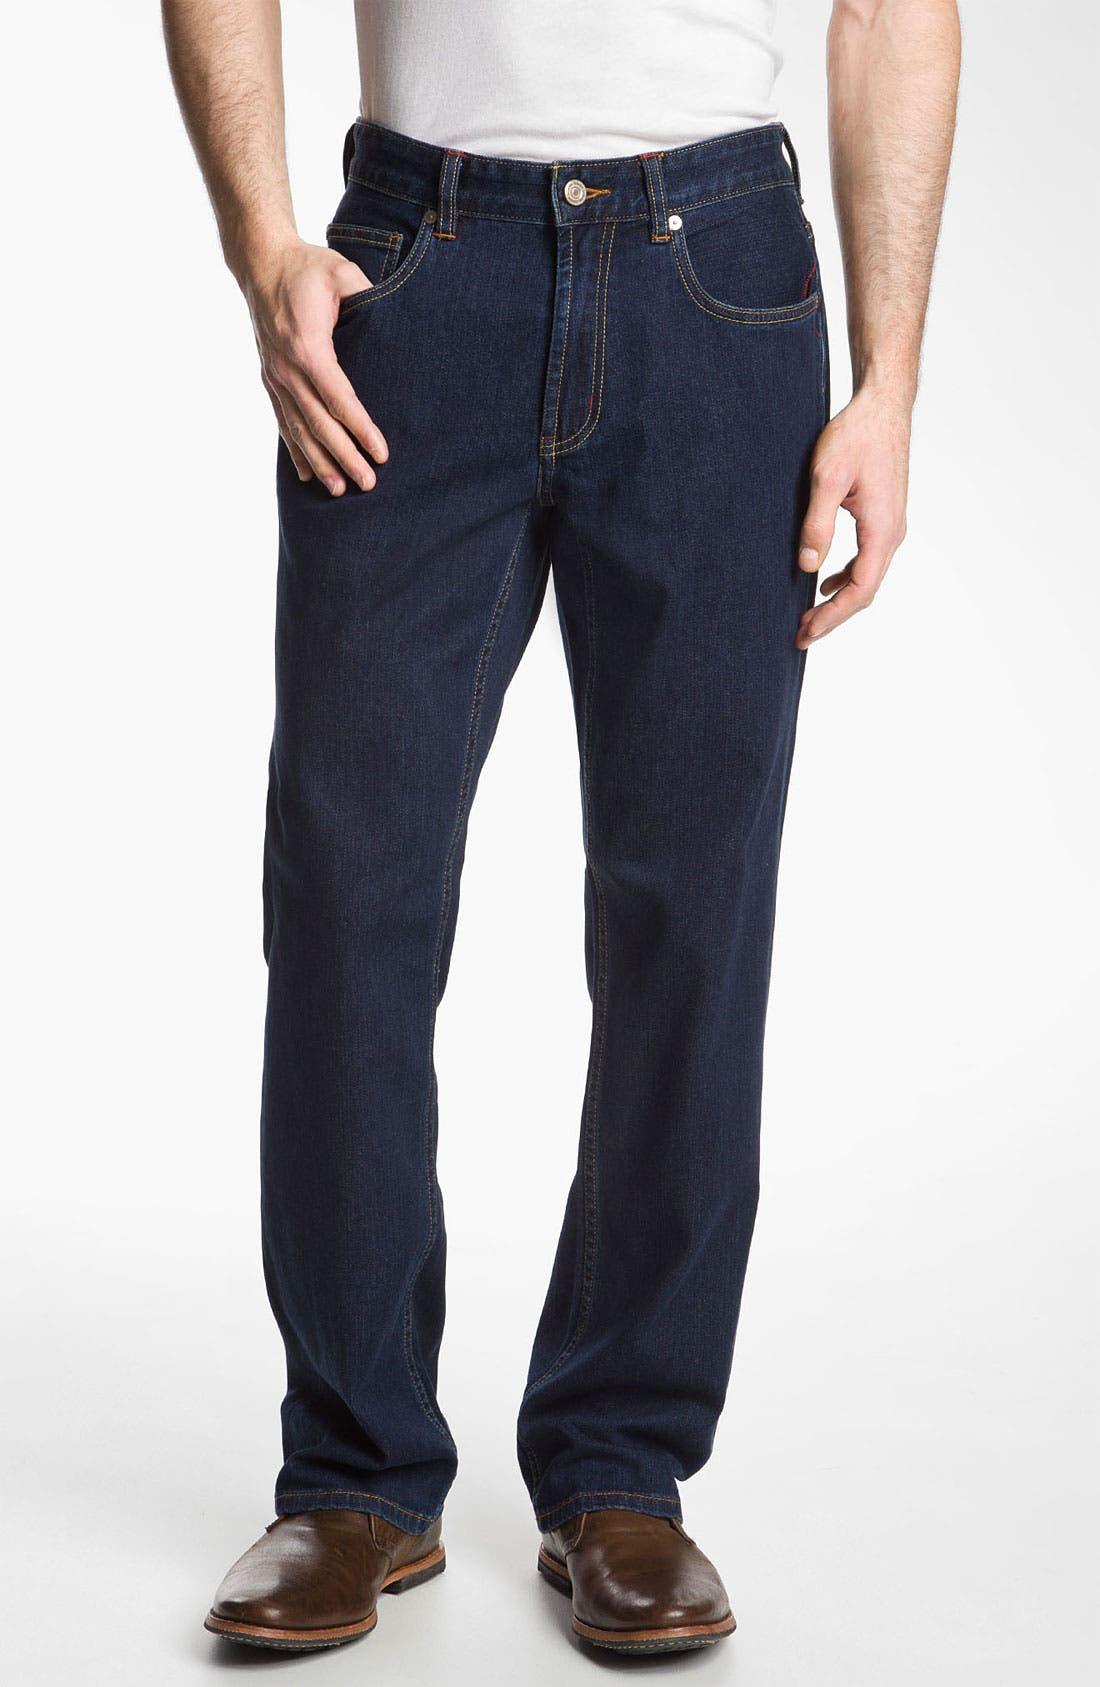 Alternate Image 1 Selected - Tommy Bahama Denim 'Original Cooper' Jeans (New Rinse)